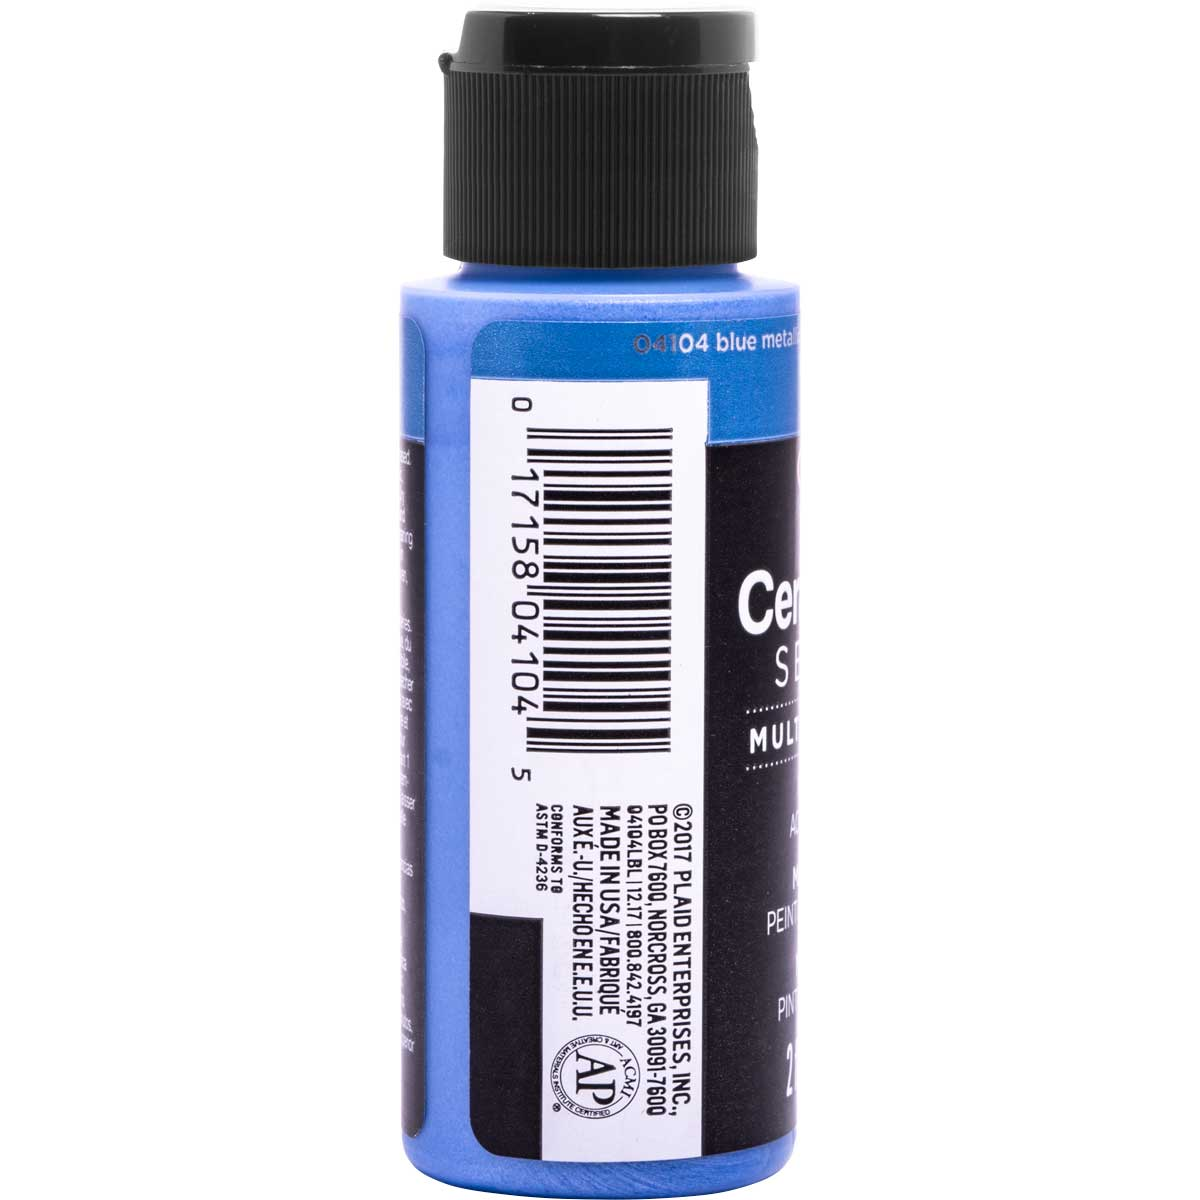 Delta Ceramcoat ® Select Multi-Surface Acrylic Paint - Metallic - Blue, 2 oz. - 04104